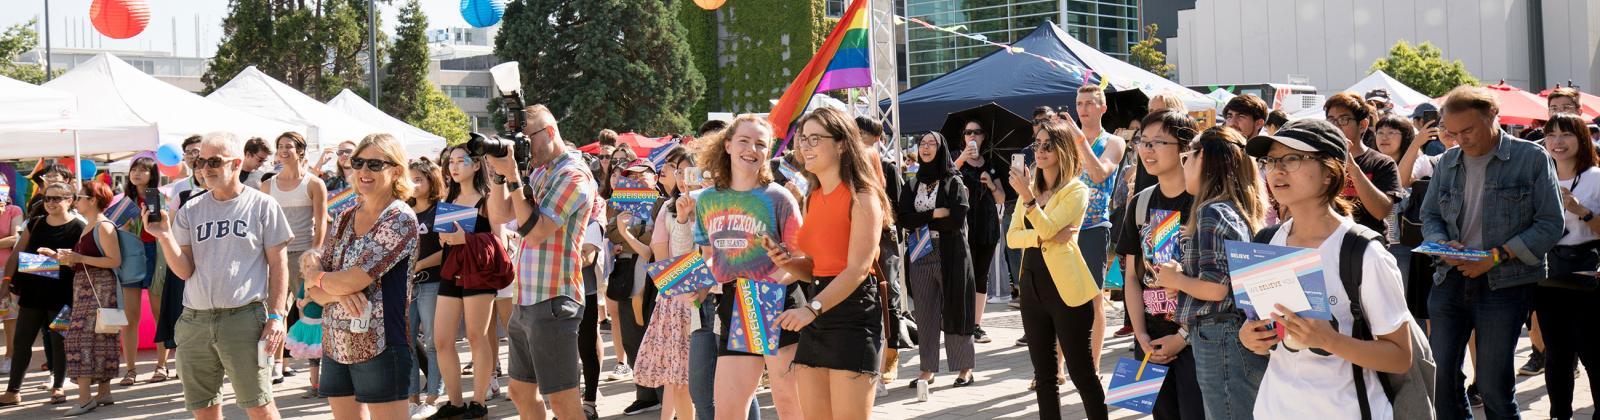 Campus community at a Pride UBC event